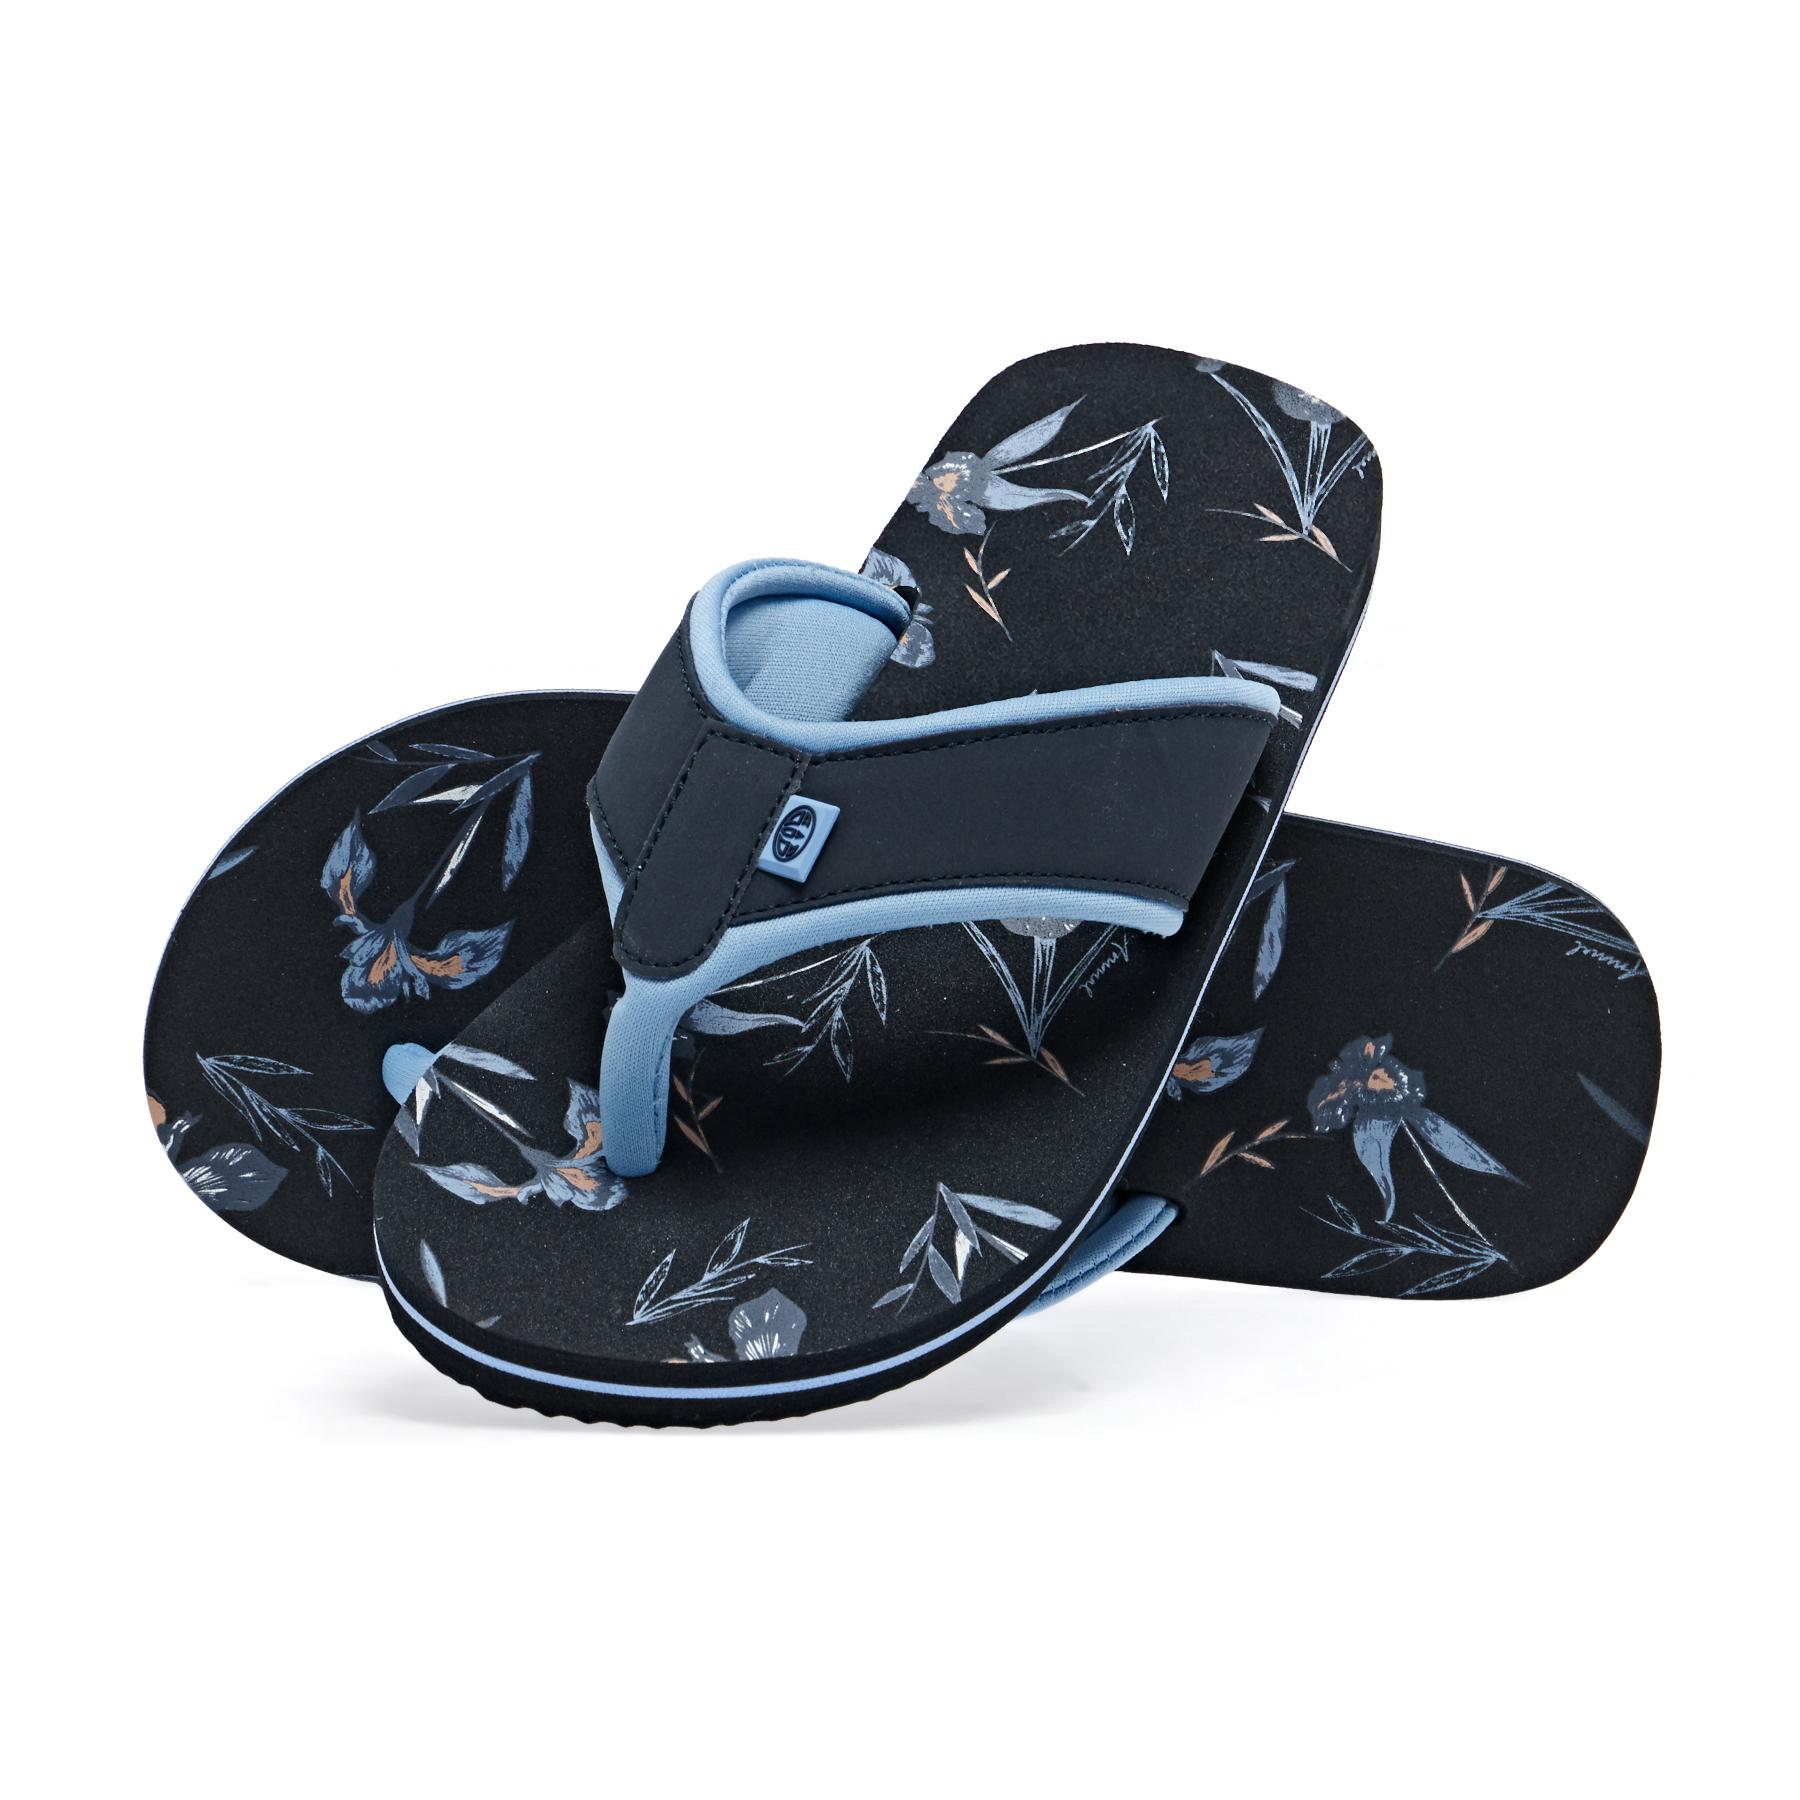 All Sizes India Ink Blue Animal Swish Aop Flip Flops